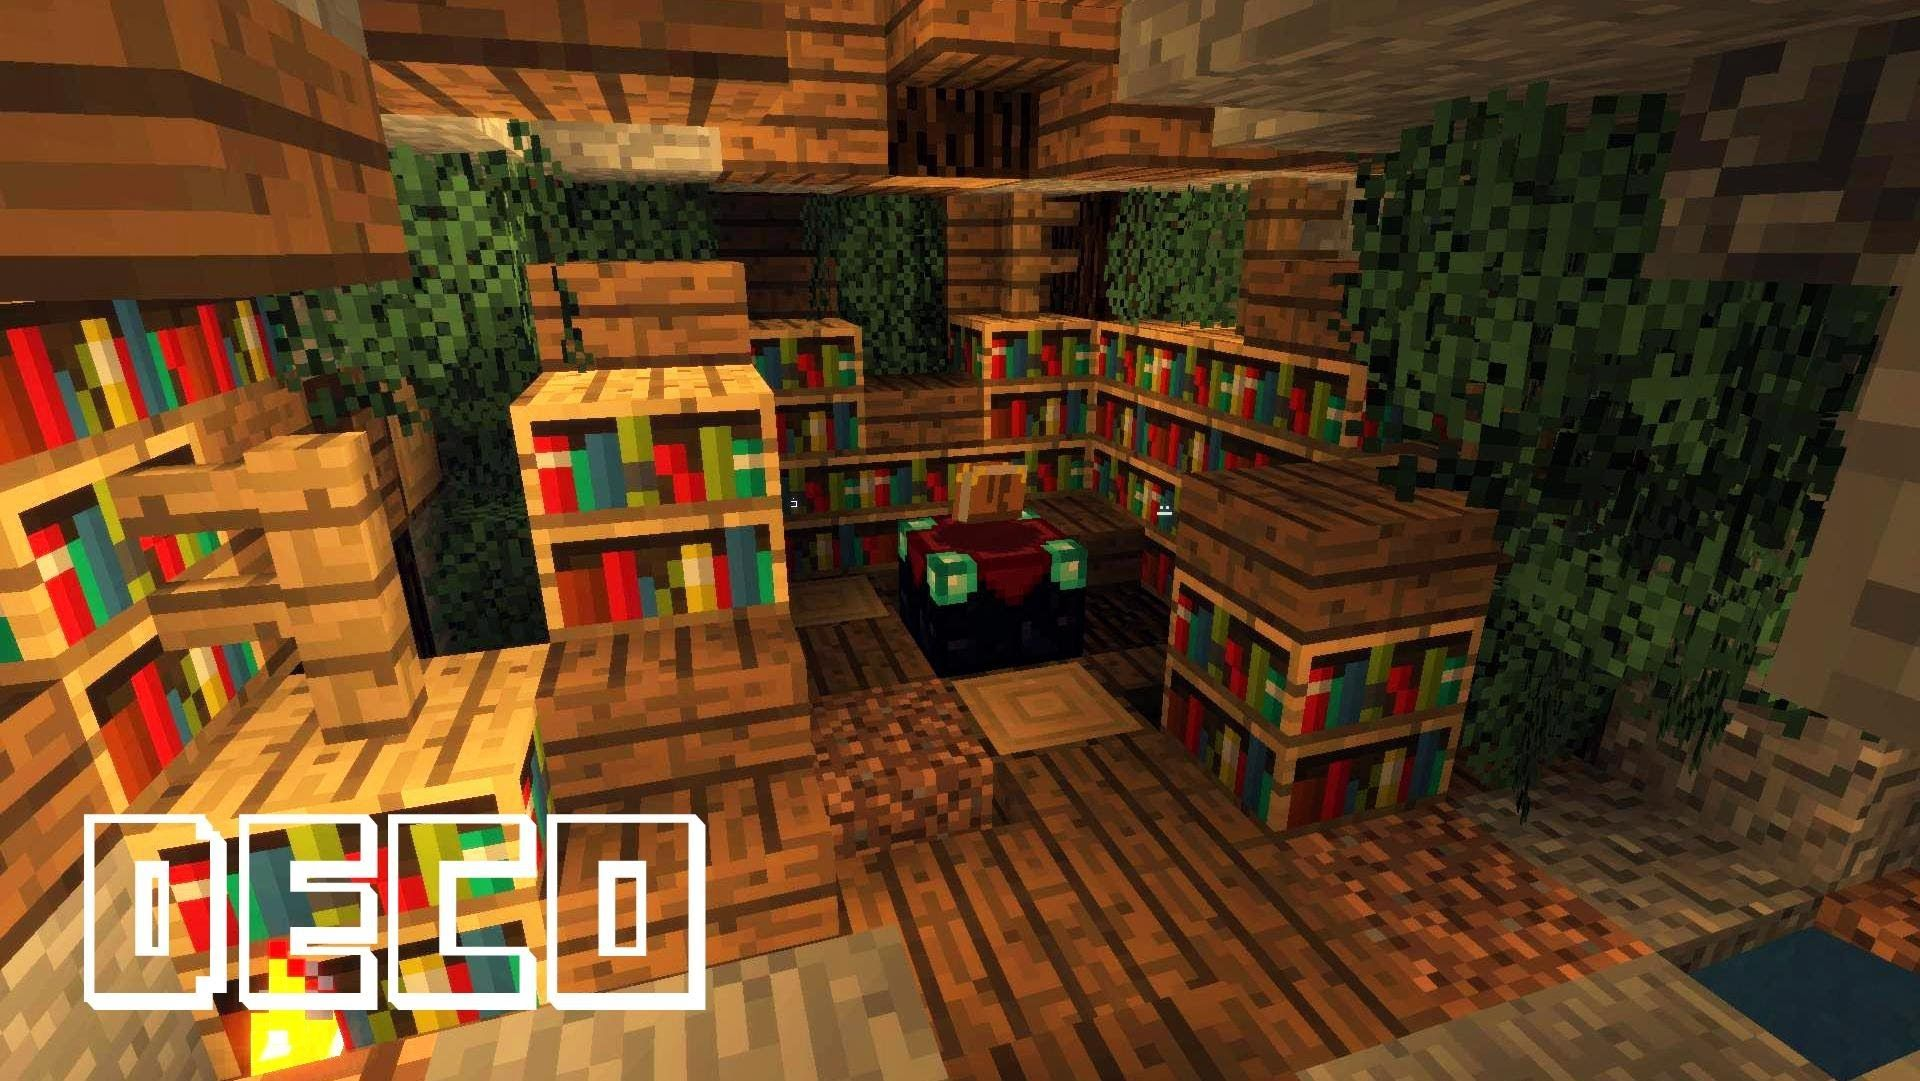 Minecraft Creer Une Bibliotheque Ancienne Minecraft Minecraft Architecture Minecraft Medieval